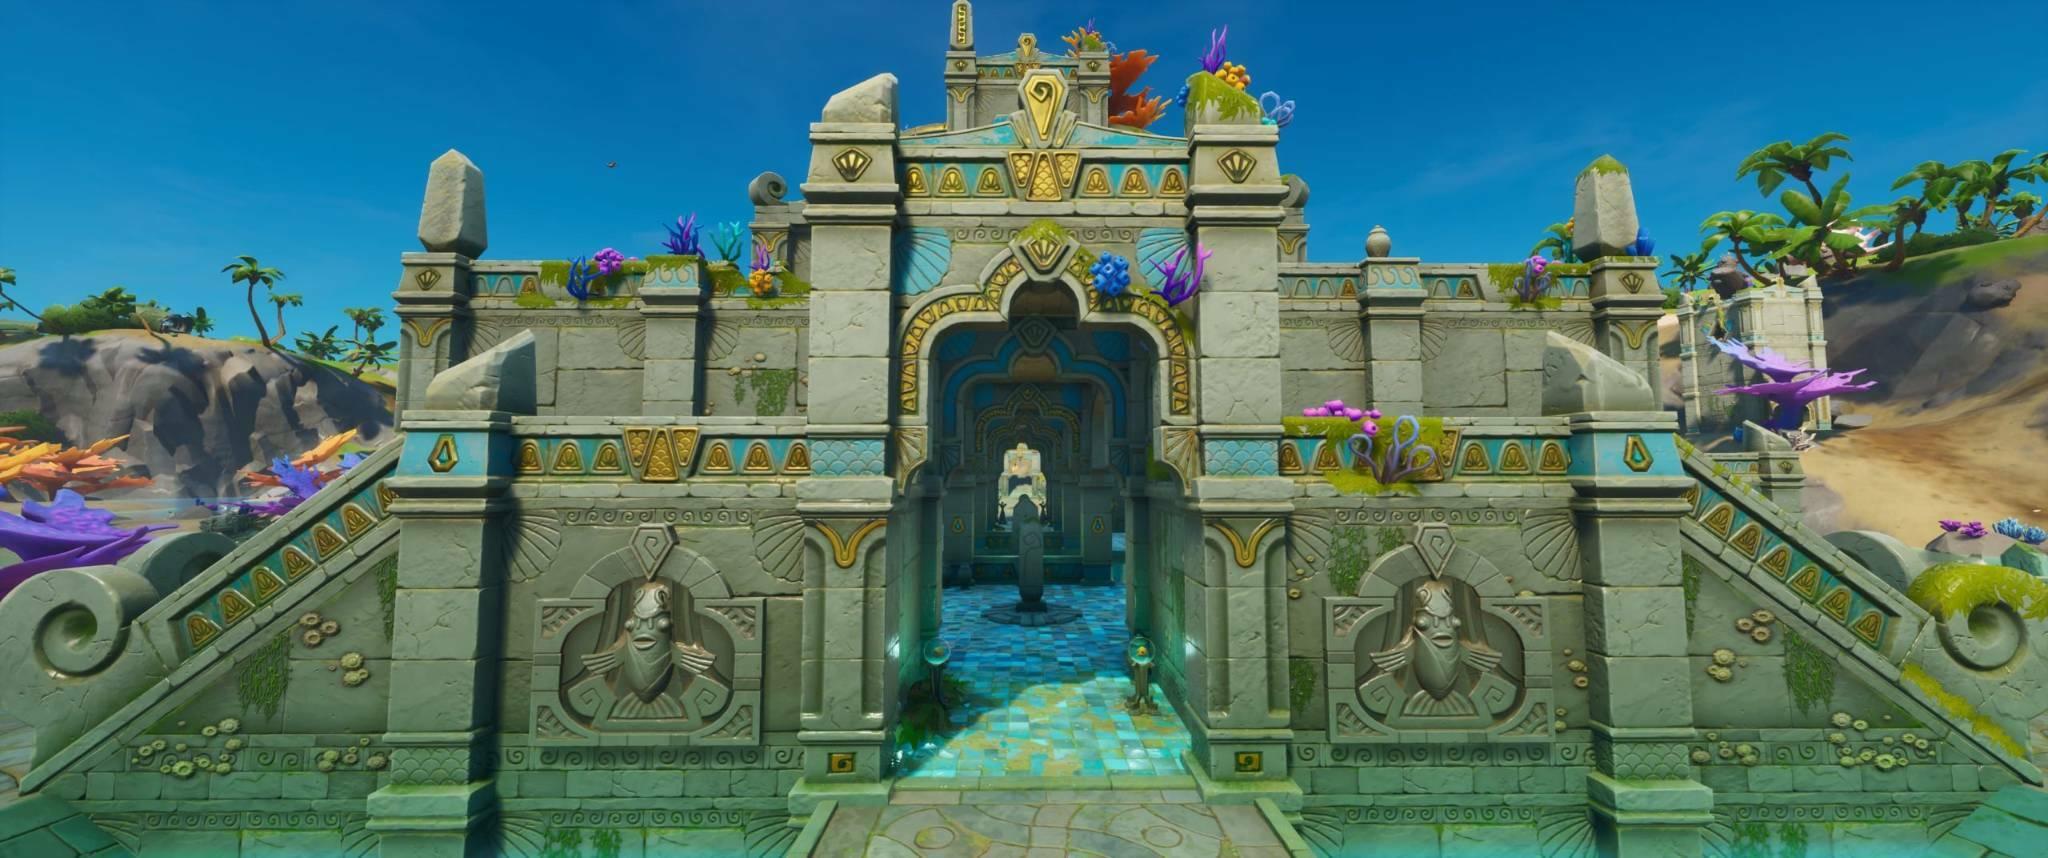 Fortnite florida miami battle royale coral castle causa legale